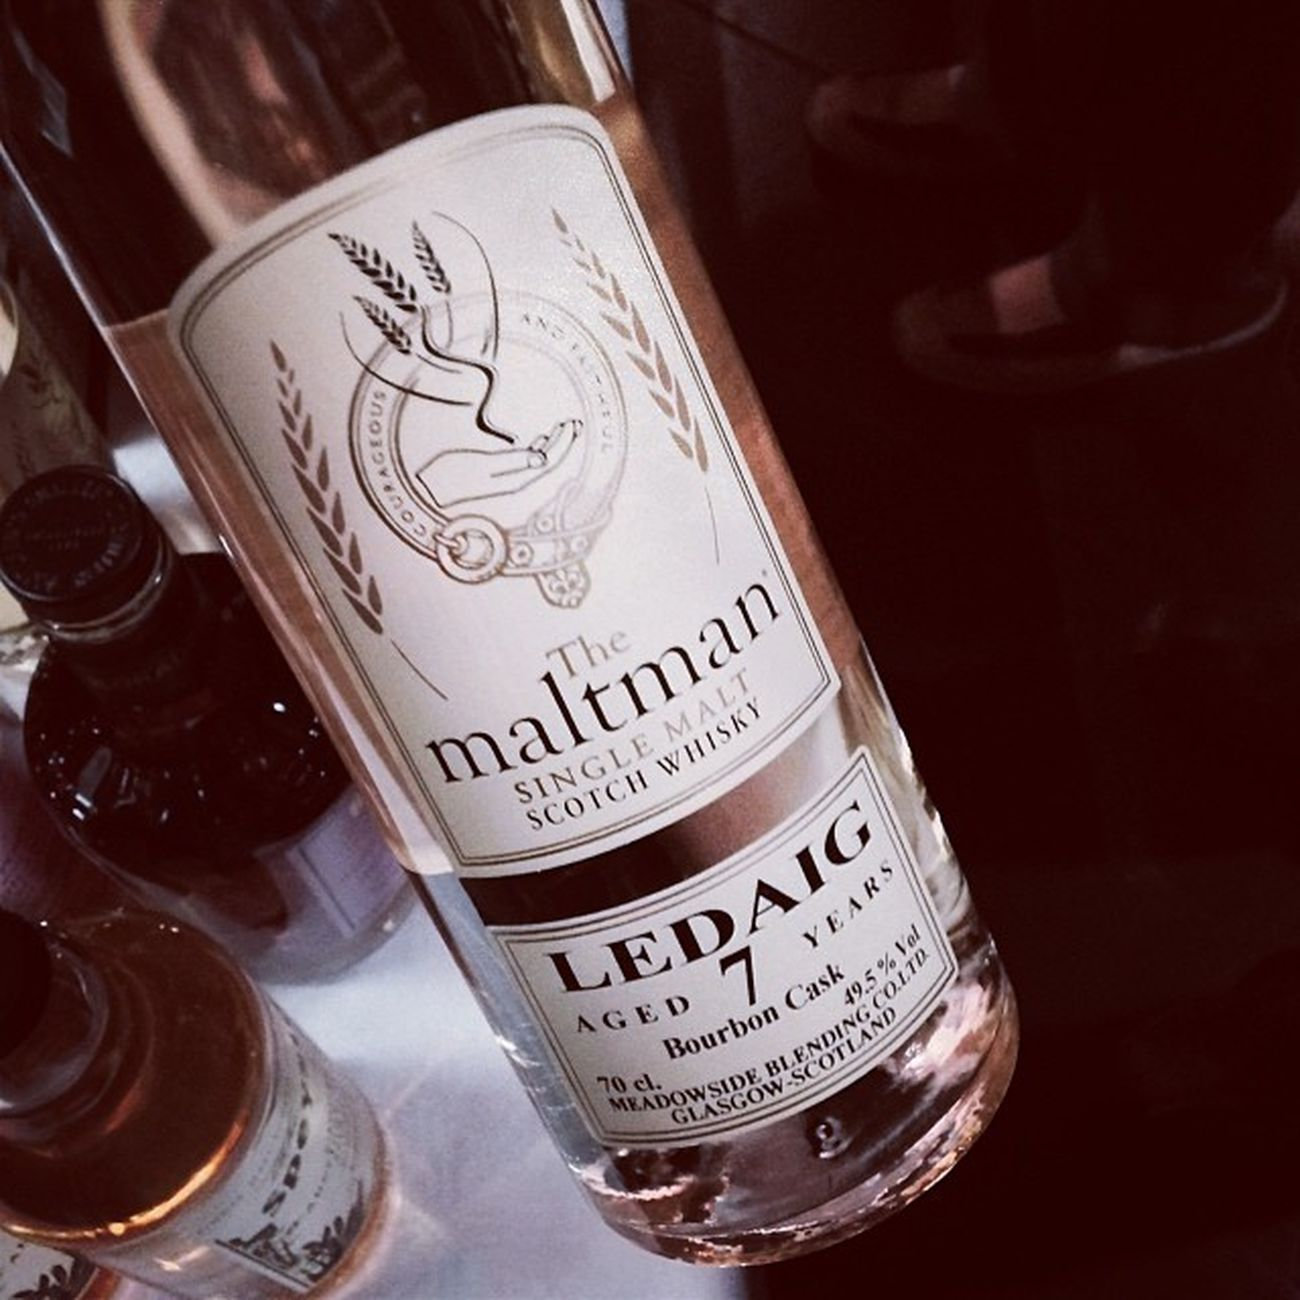 Nr. 4: Ledaig 7 Jahre, The Maltman... #whiskyzug Blumberg Themaltman Maltman Tasting Whiskytasting Scotland Whiskyzug Whisky Zollhaus Islemull Scotch Wutachtal 7years Ledaig Schottland 7jahre Singlemalt Tasteup Sauschwaenzlebahn Eisenbahnmuseum